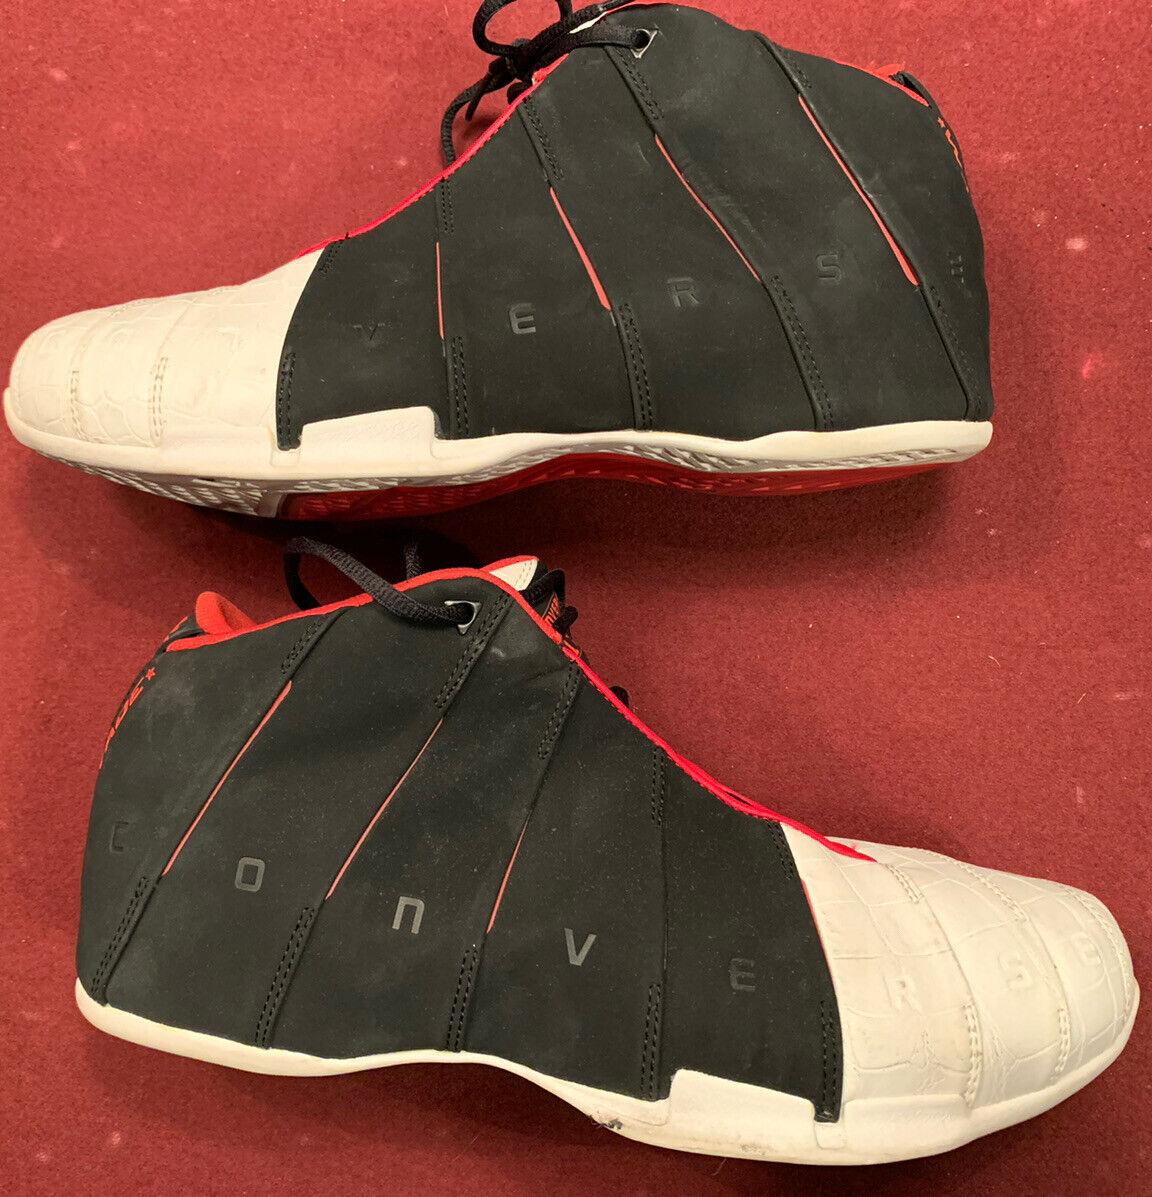 Converse Dwyane Wade 1 купить на eBay в